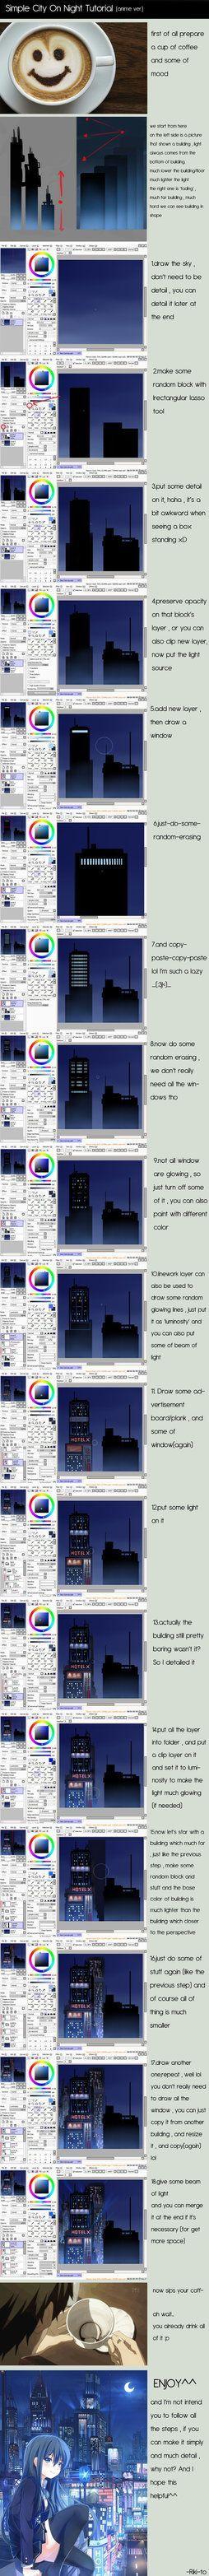 City On Night Tutorial [Paint Tool SAI] by Riki-to.deviantart.com on @DeviantArt